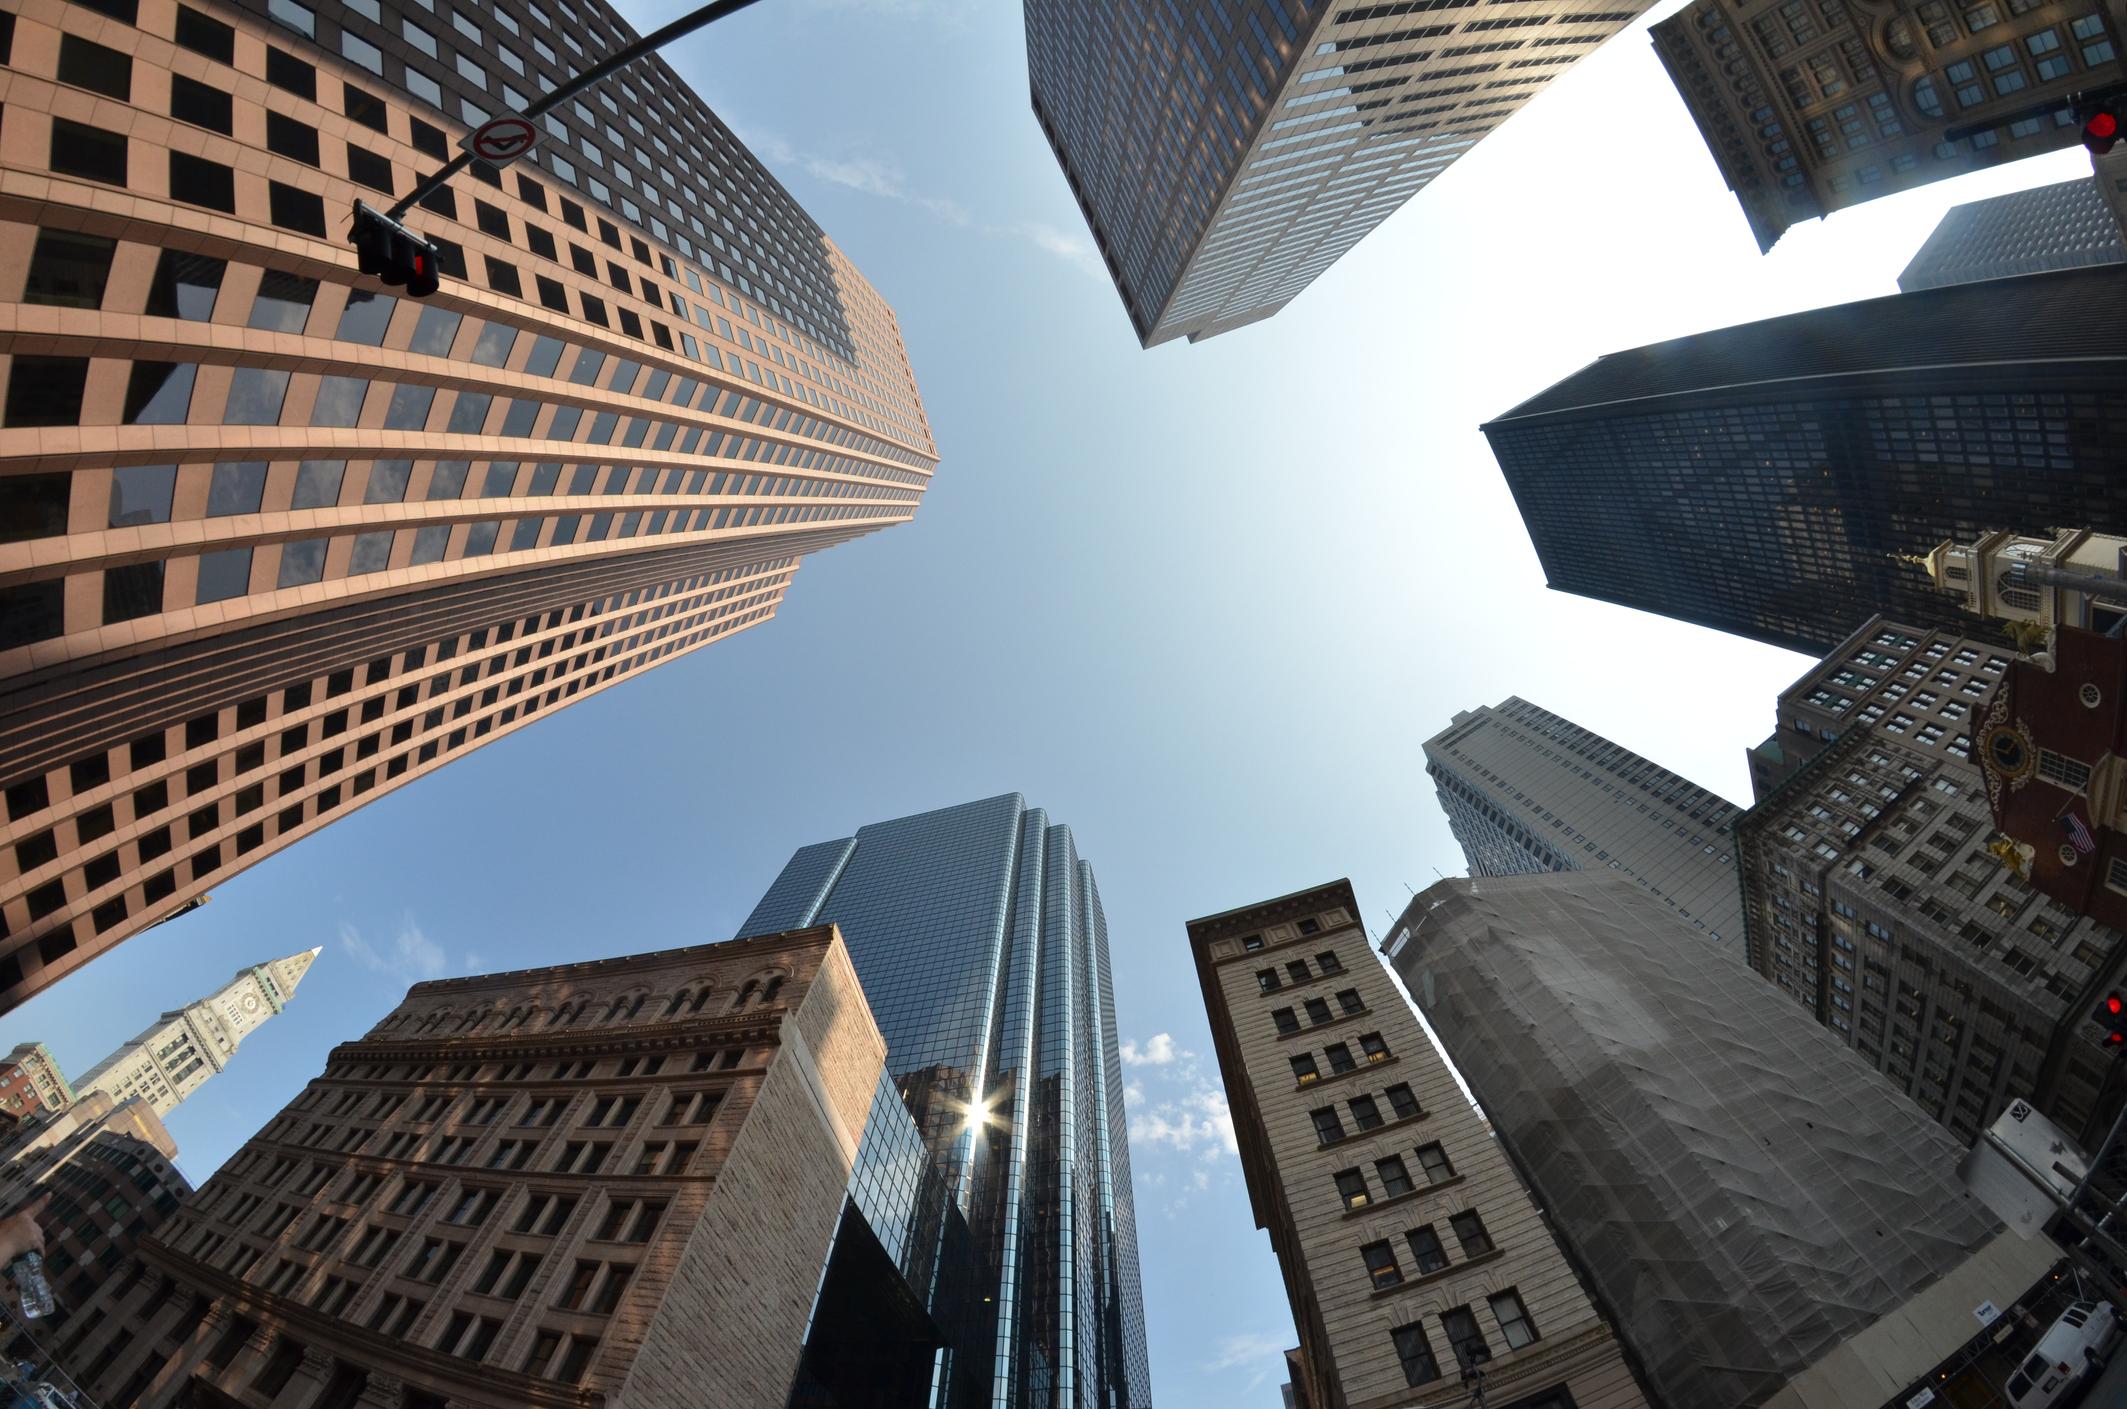 Fish-eye lens of building, Boston, US.